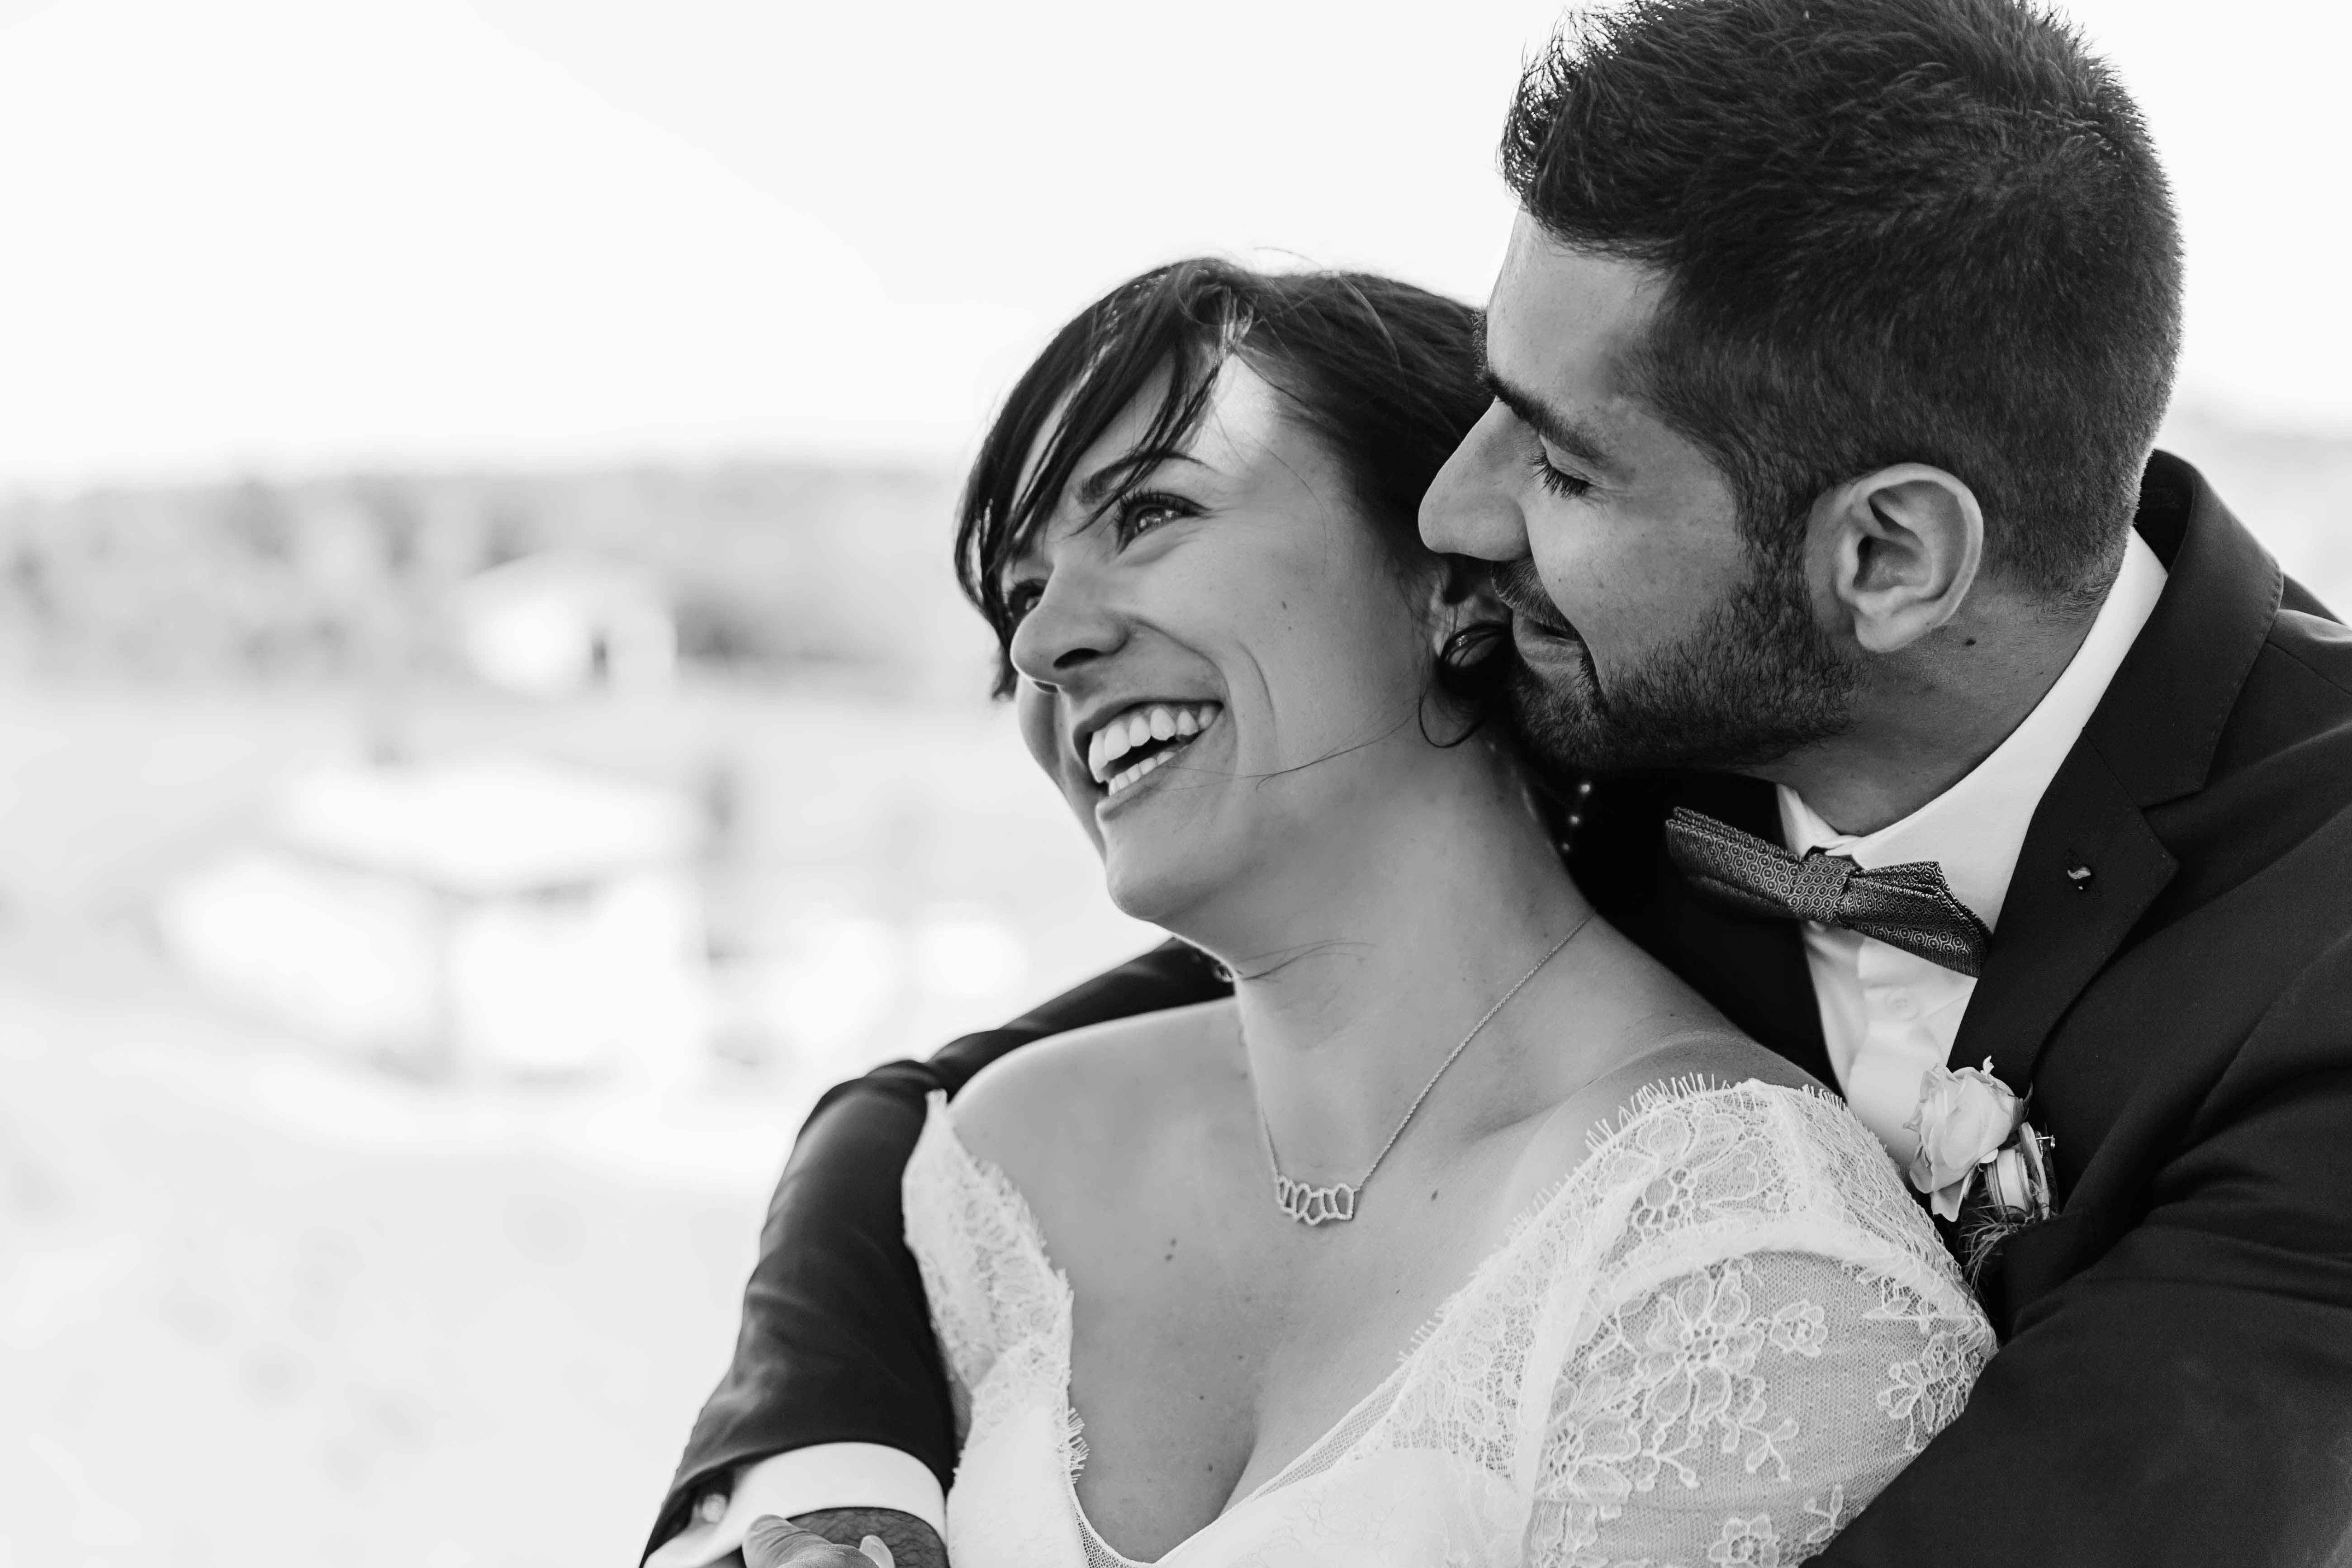 photographe beaujolais lyon calin amour couple image